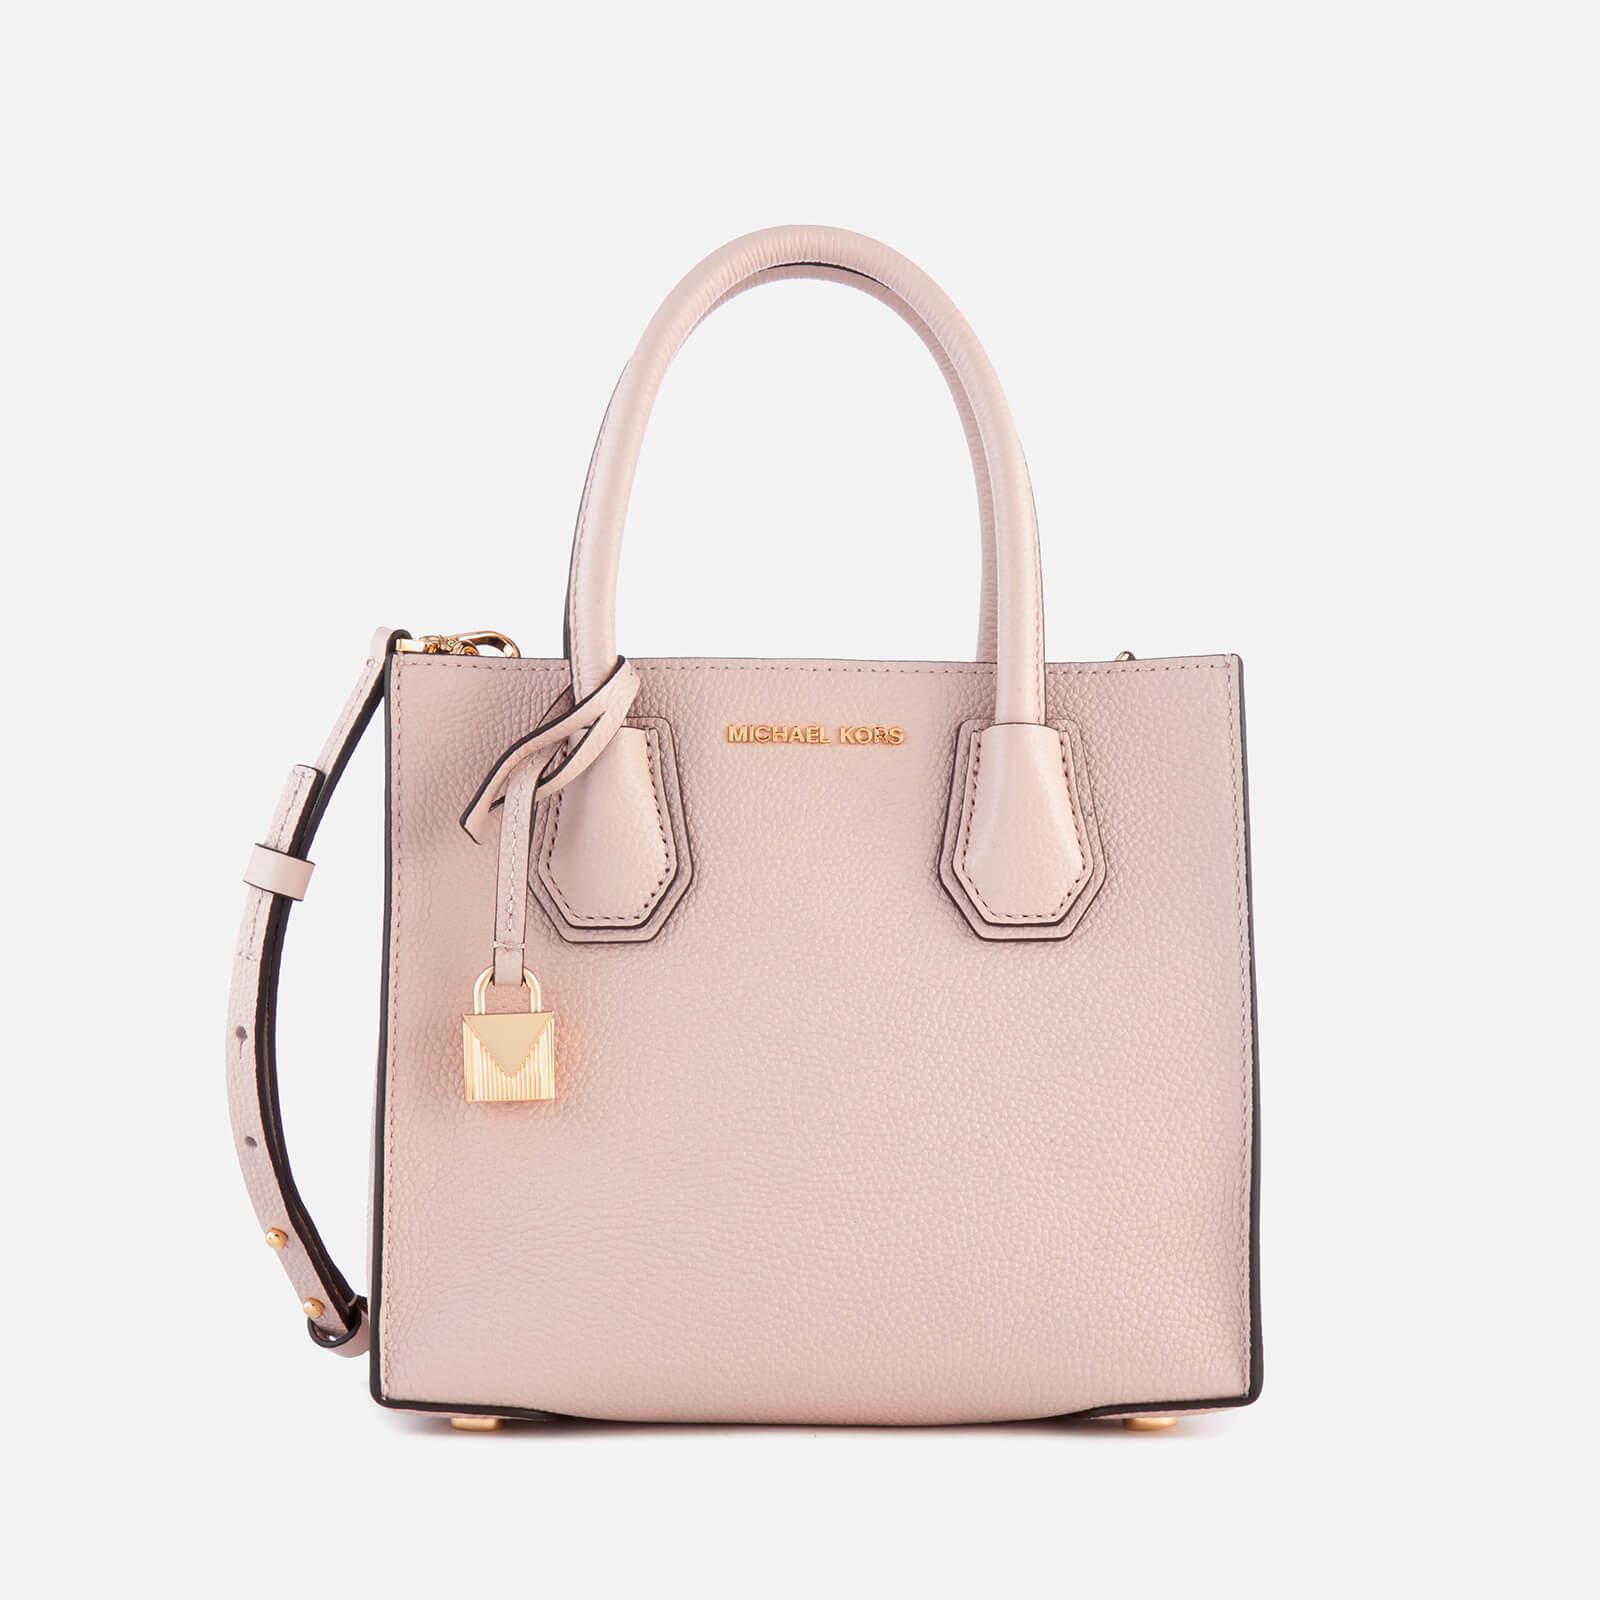 MICHAEL MICHAEL KORS Women s Mercer Medium Tote Bag - Soft Pink ... 534c6d05bc